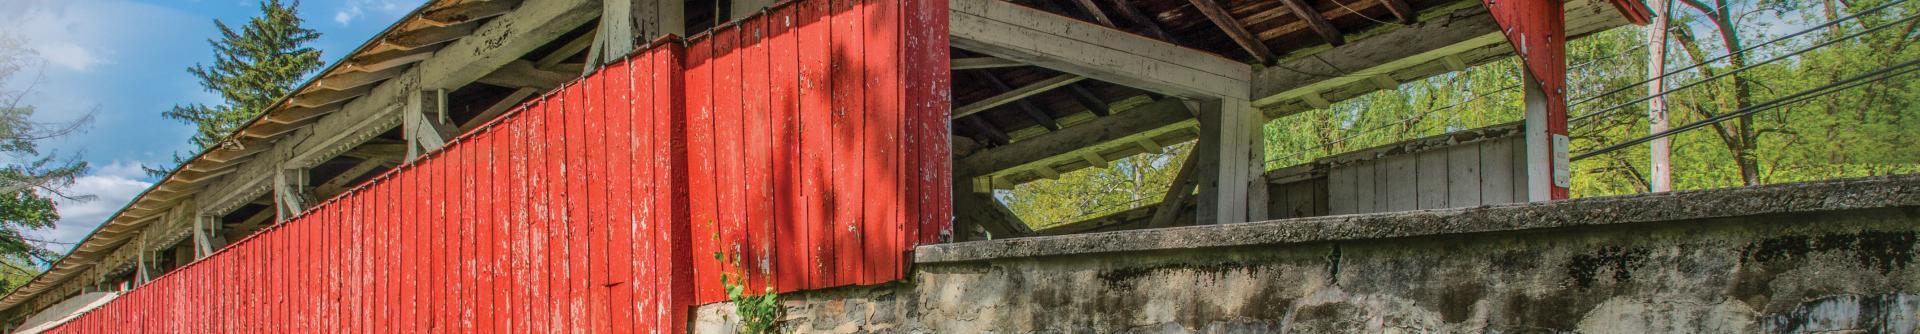 Bogert's Covered Bridge, Lehigh Valley, PA